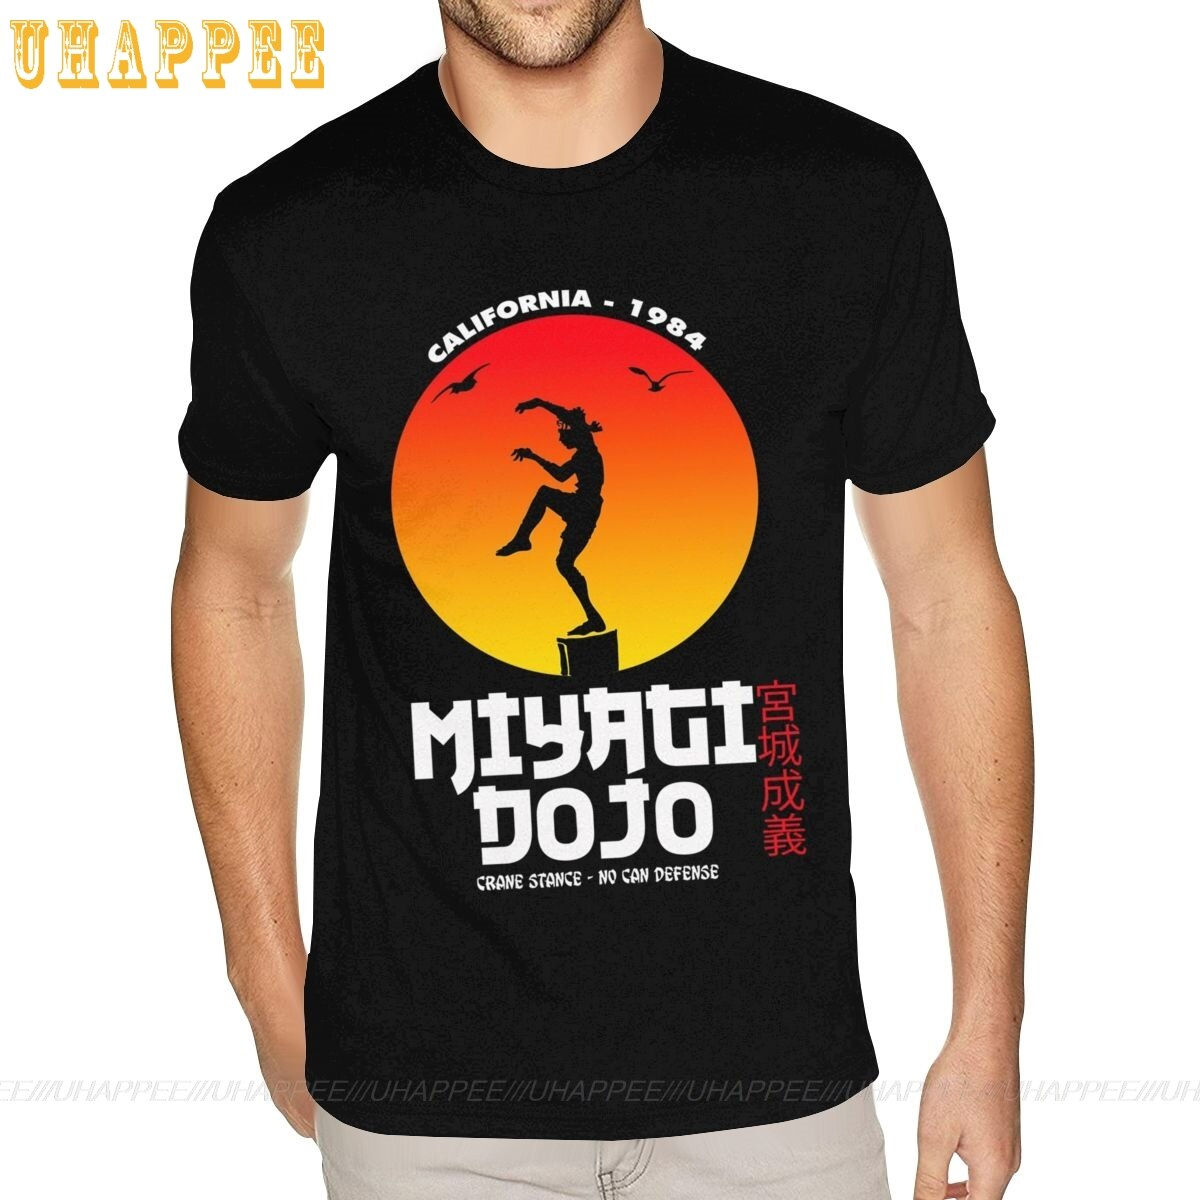 3XL Miyagi Dojo T-shirts Homme Grunge Stil Kurzarm Rundhals Männer Sommer T Shirts Rabatt Kleidung